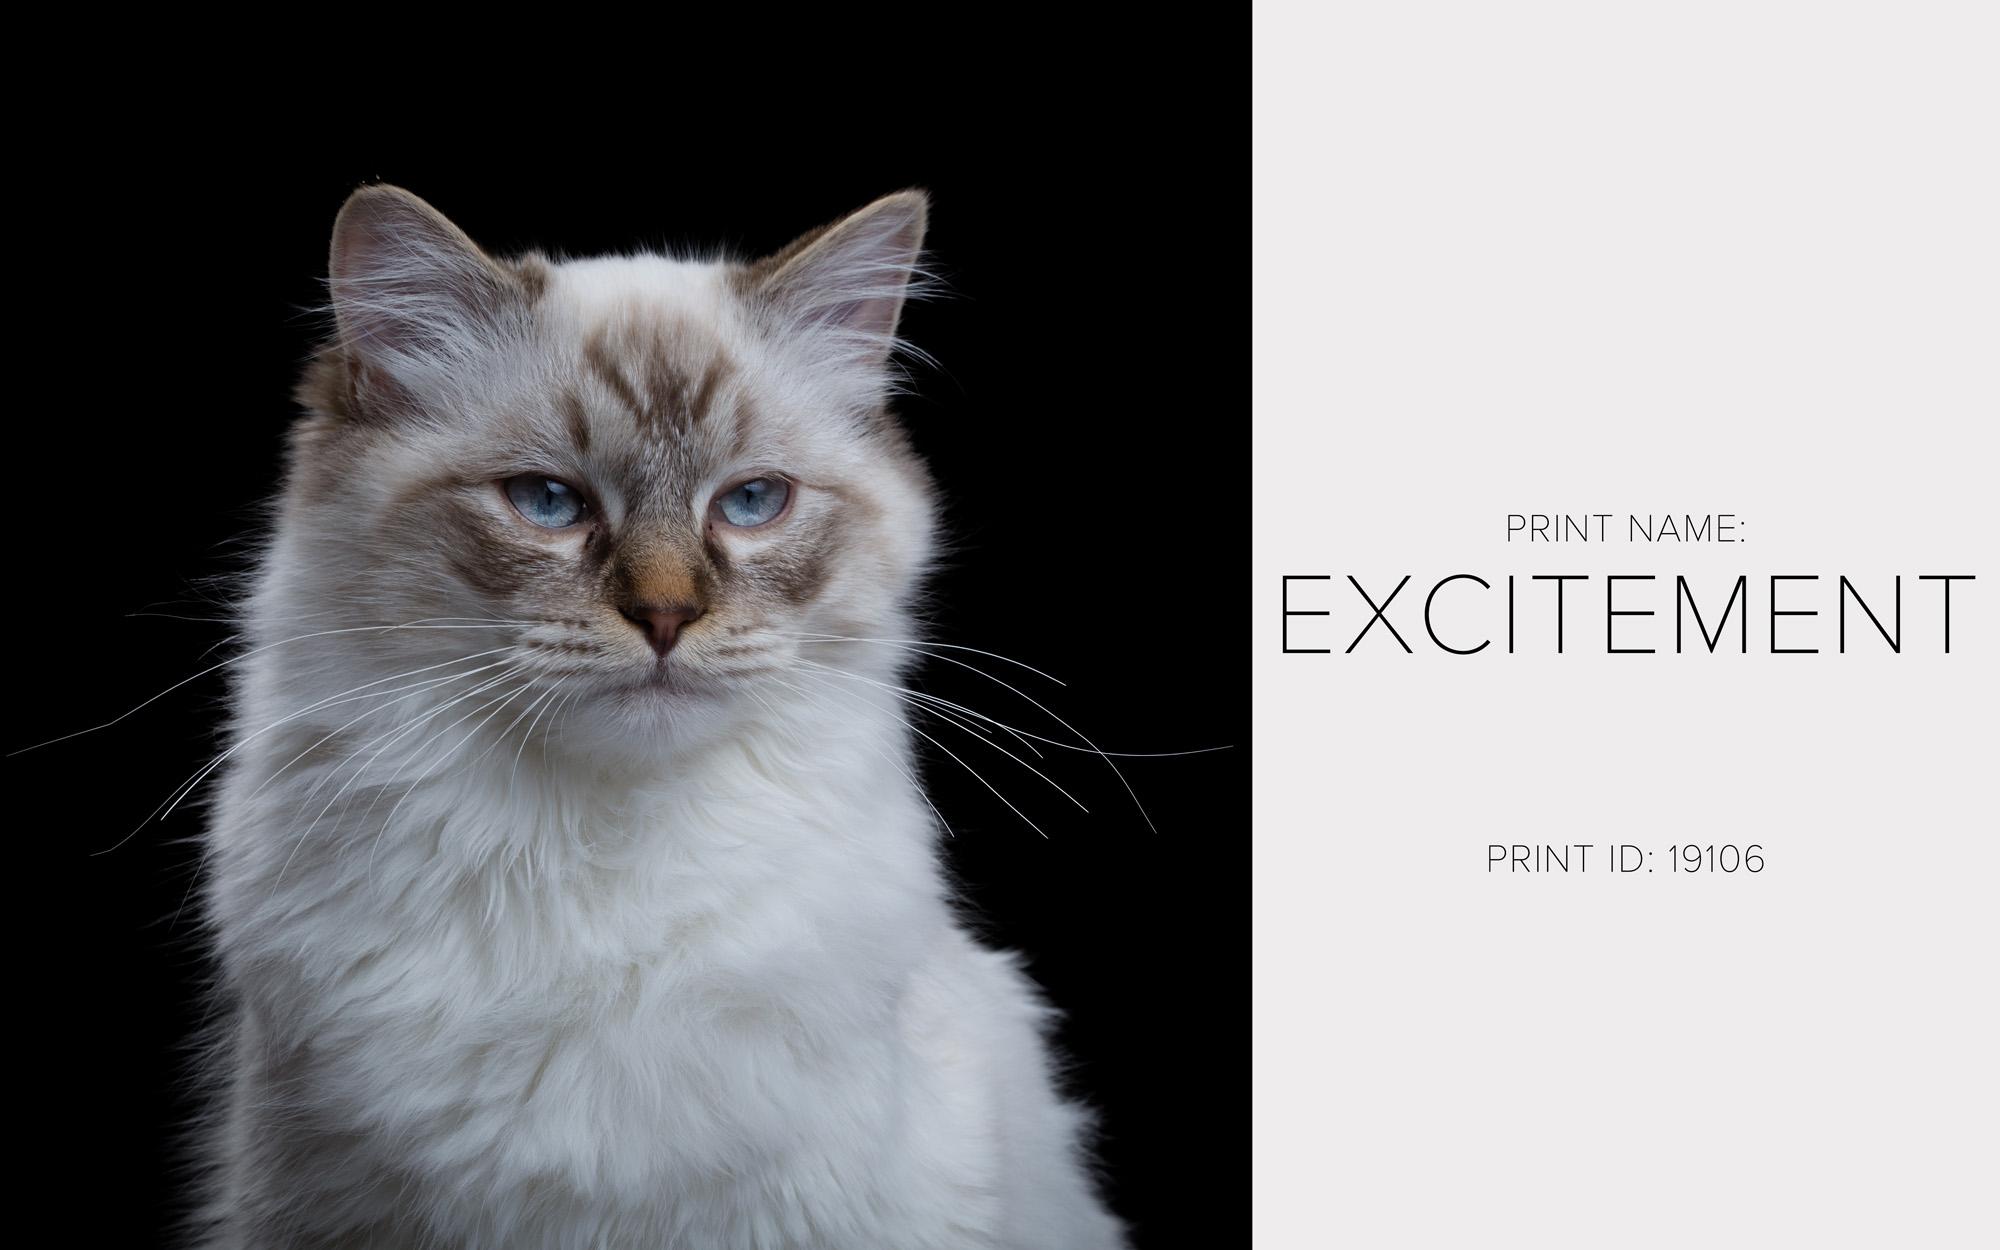 Excitement_Thumb.jpg